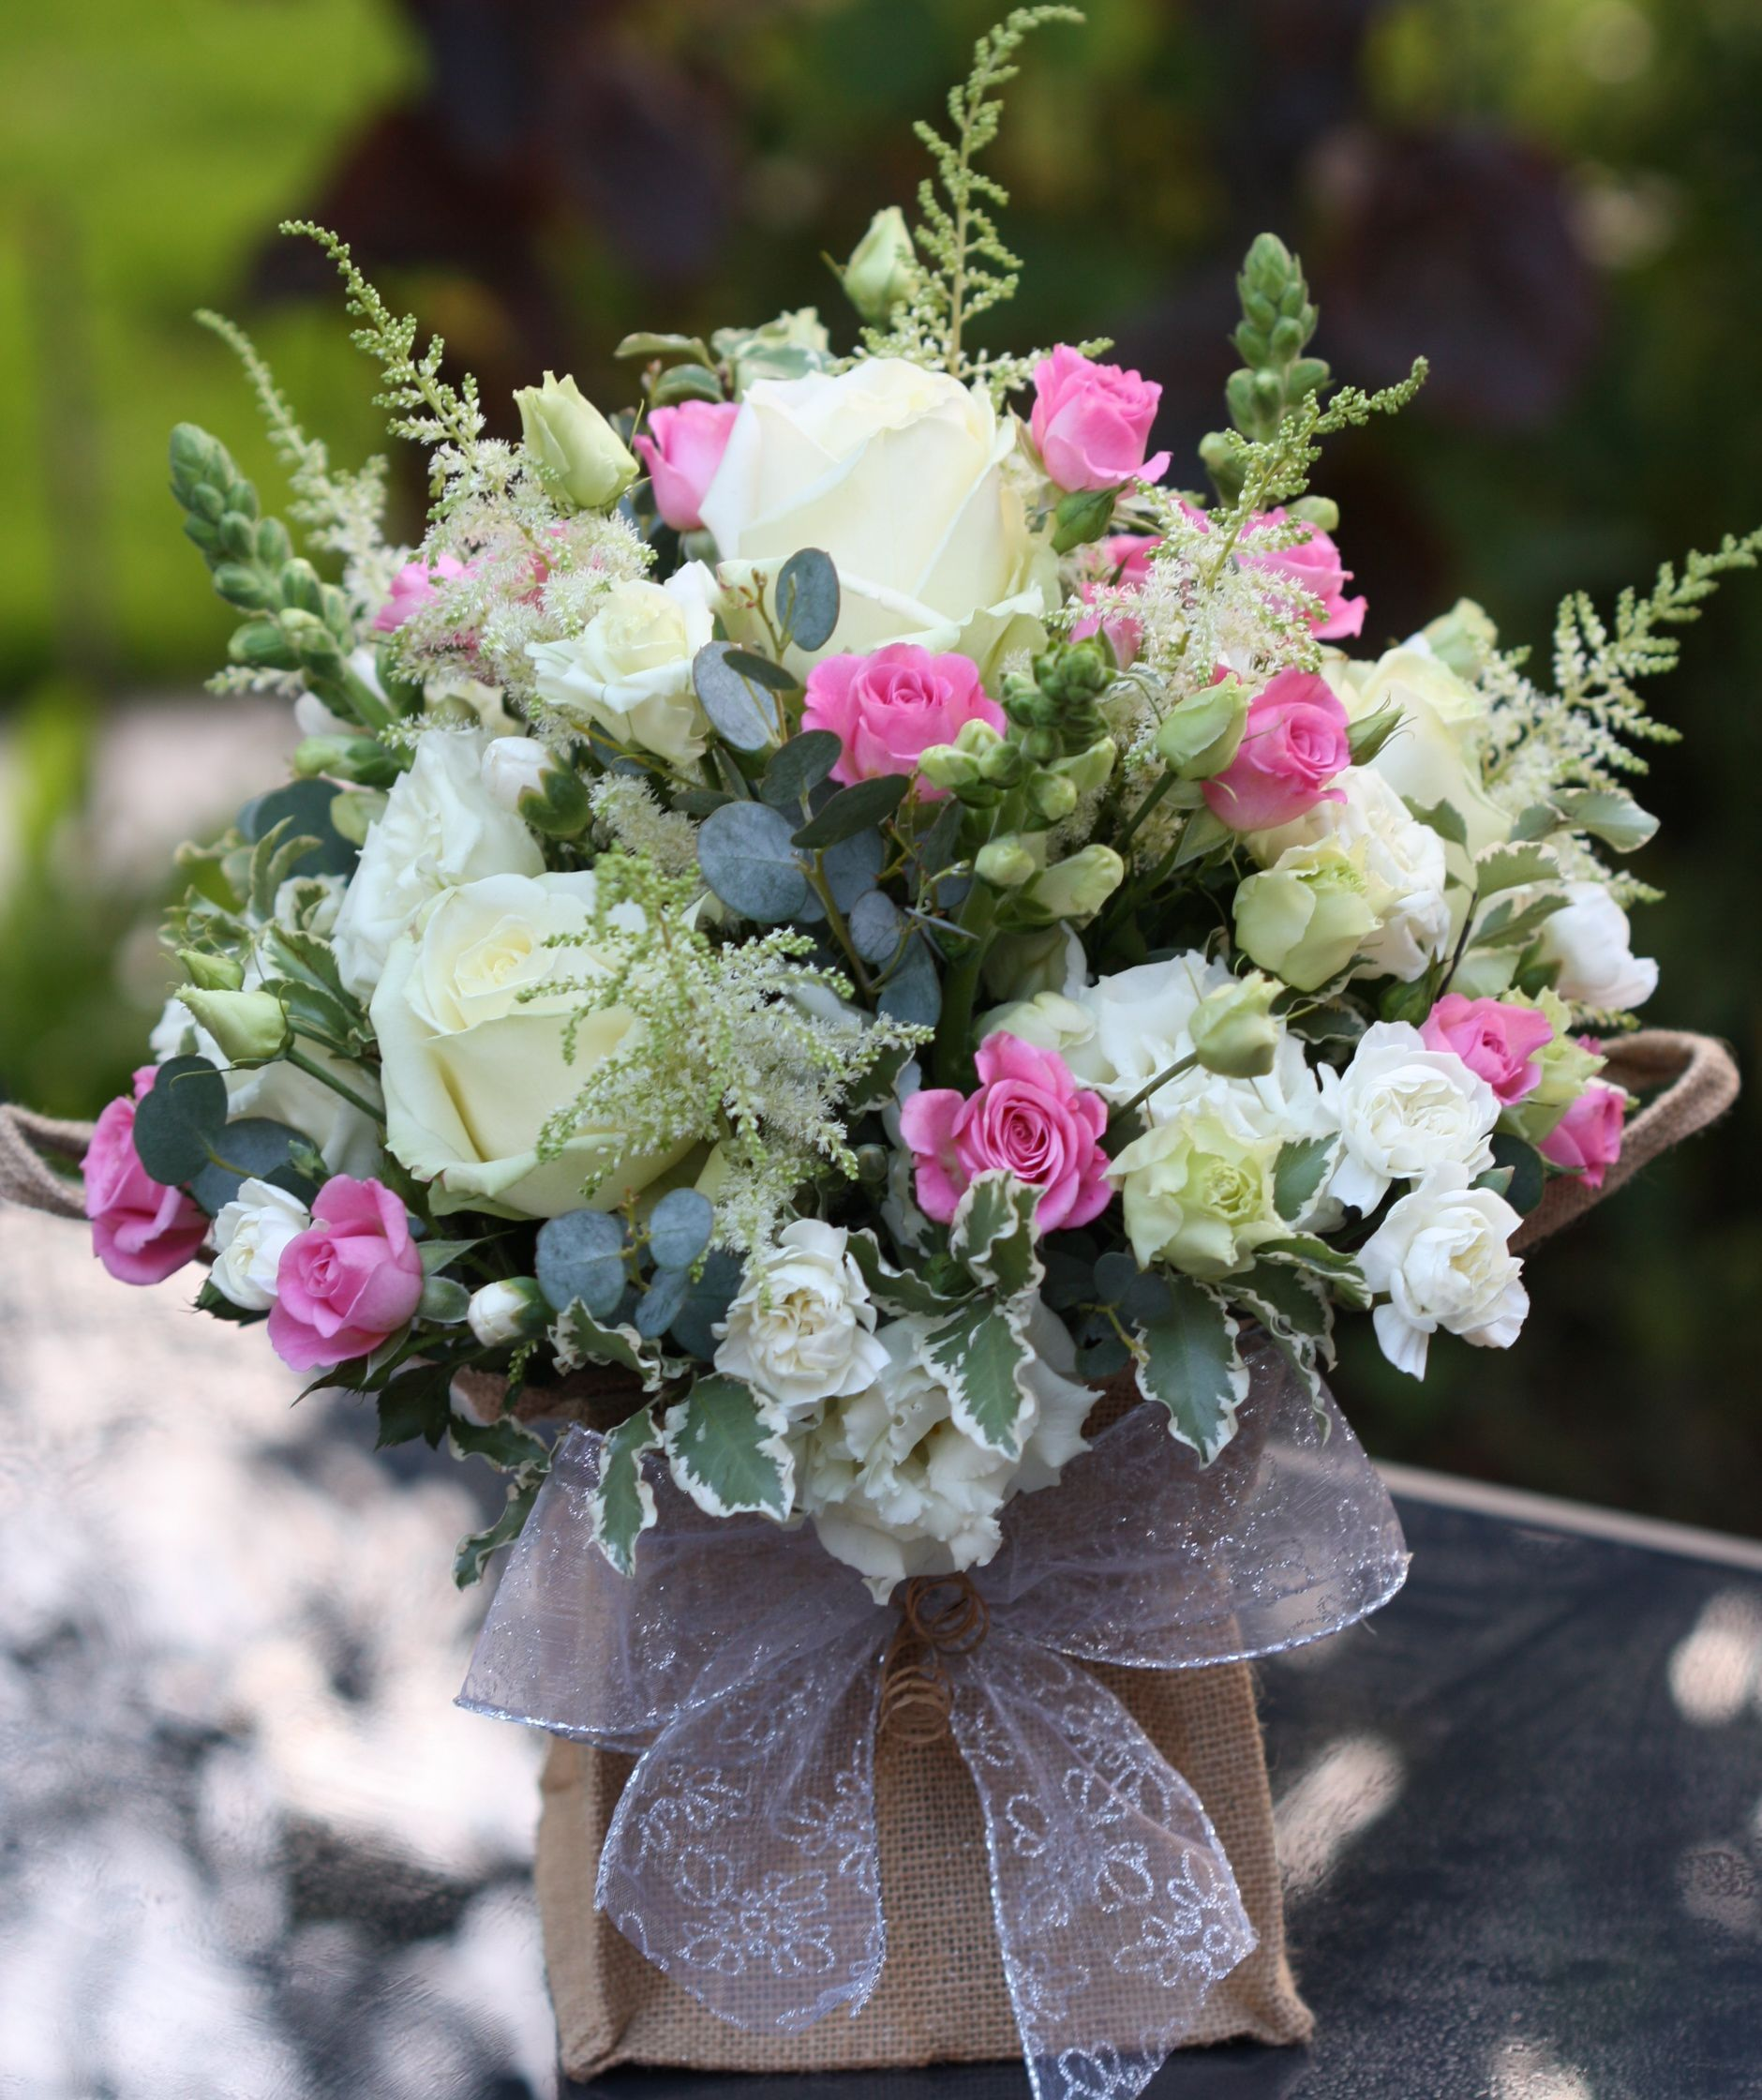 Silver Wedding Anniversary Flowers By Pip Of Willow Floristry Www Willowfloristry Co Uk Www Facebook Com Wil Anniversary Flowers Flower Arrangements Floristry